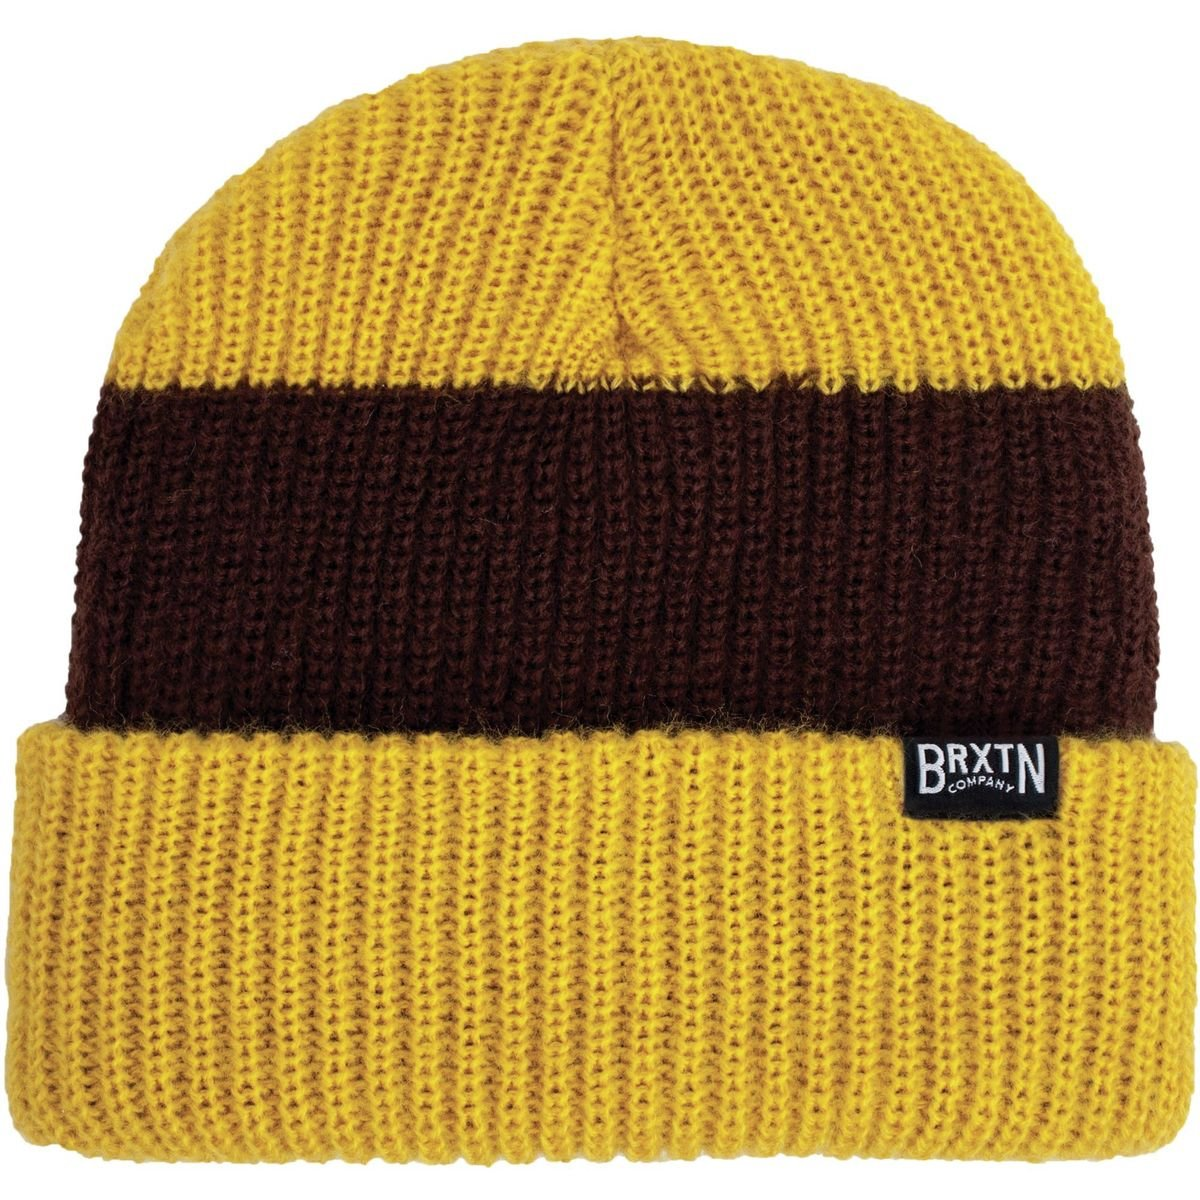 fbd86697c97 Brixton Langley Stripe Beanie in Mustard Brown